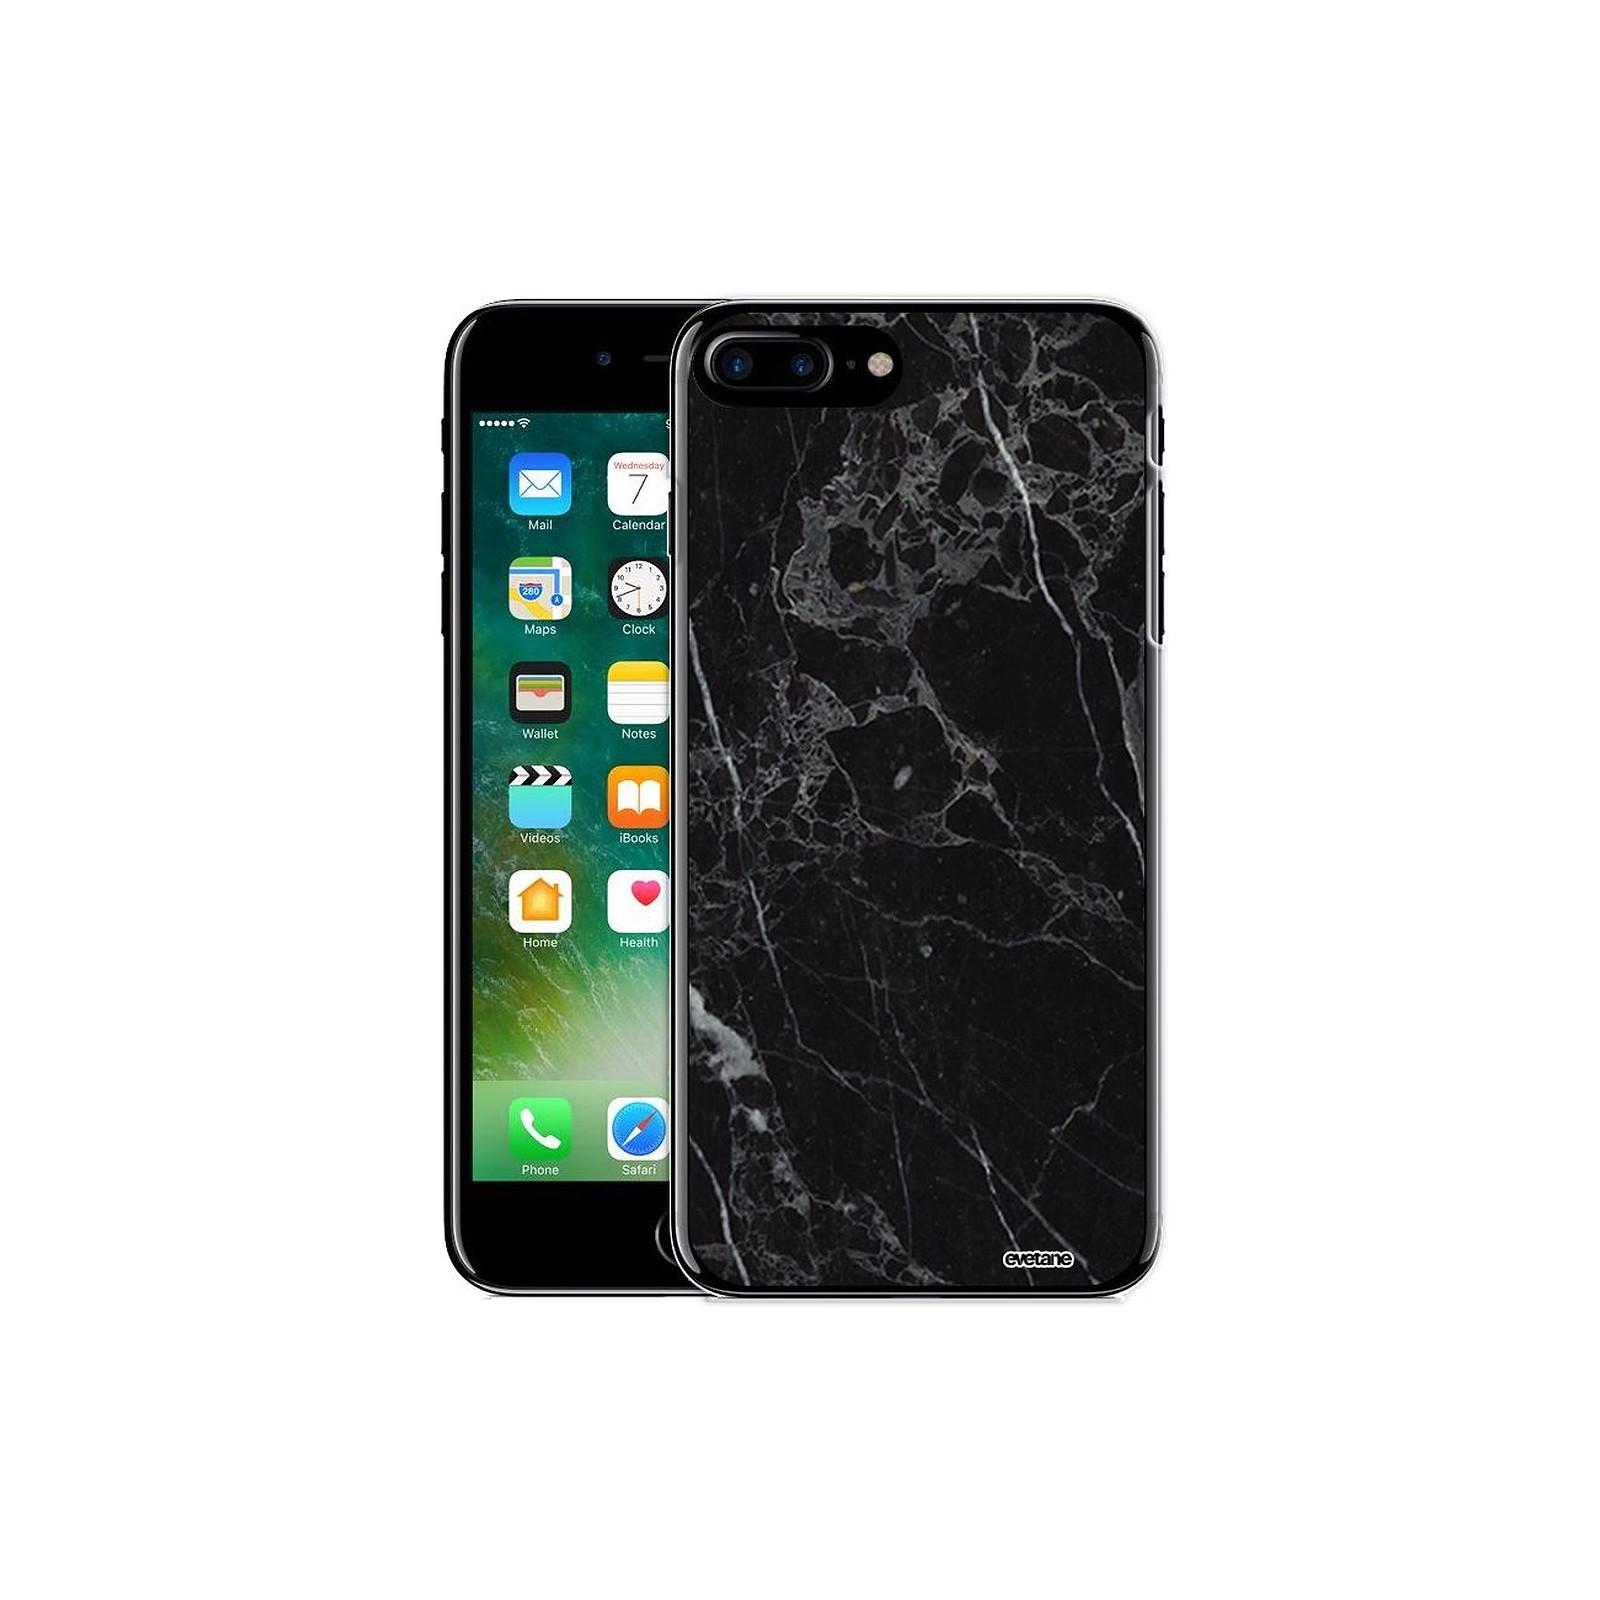 EVETANE Coque iPhone 7 Plus / 8 Plus rigide transparente Marbre noir Dessin